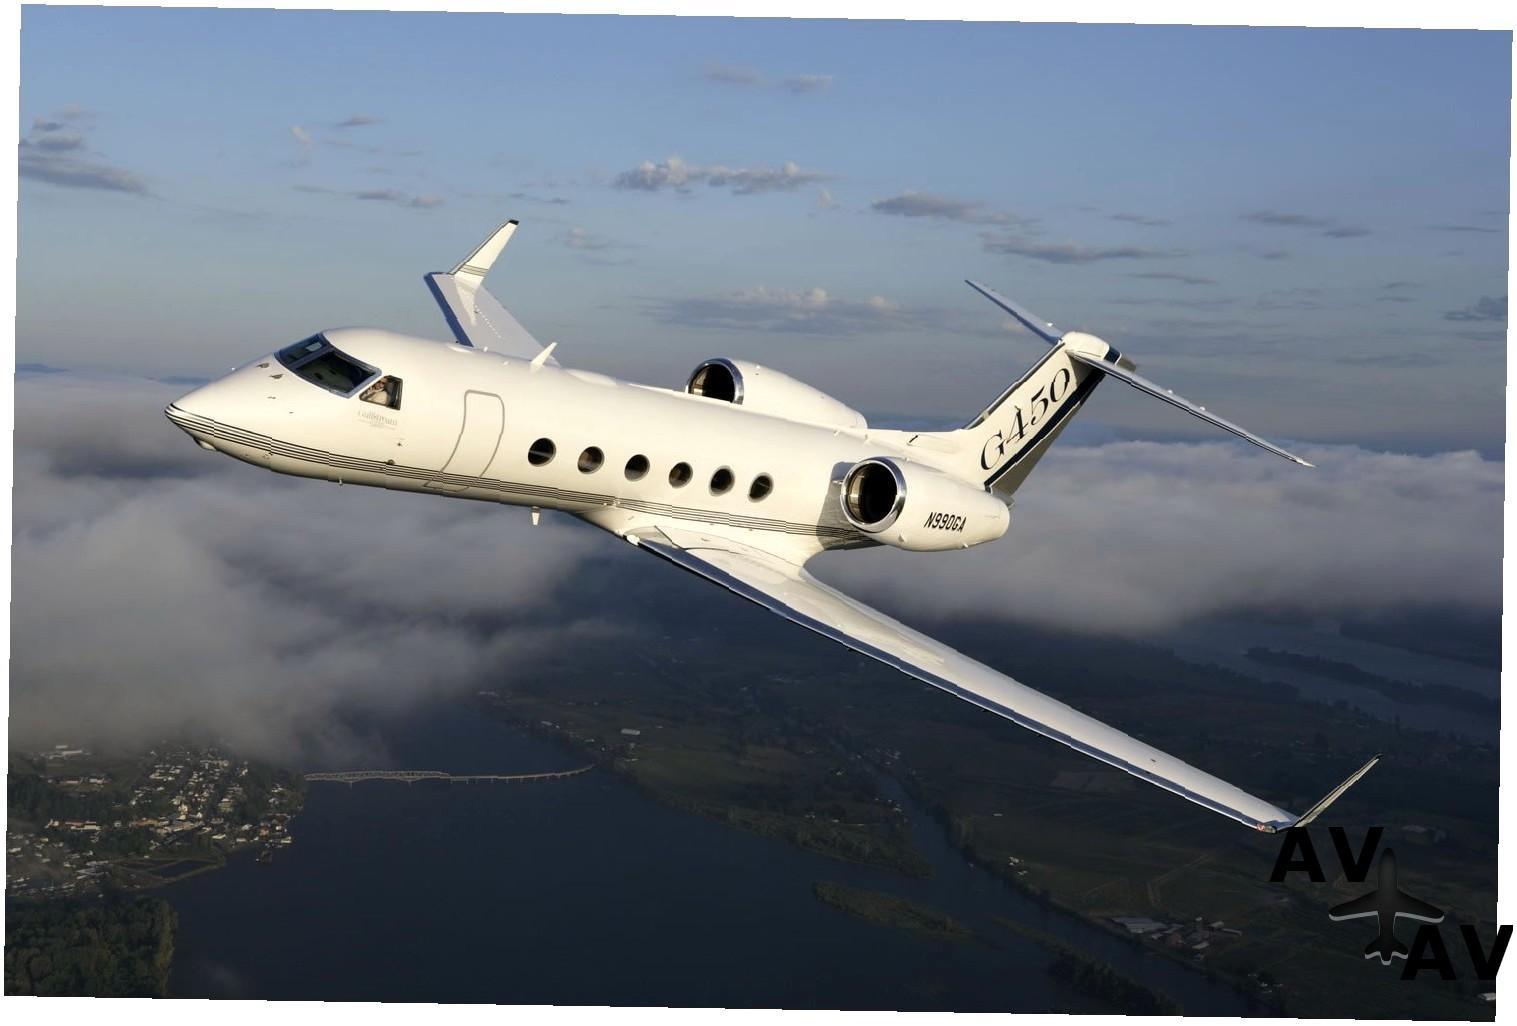 Аэропорт Пенсакола (Regional) коды IATA: PNS ICAO: KPNS город: Пенсакола (Pensacola) страна: США (United States)